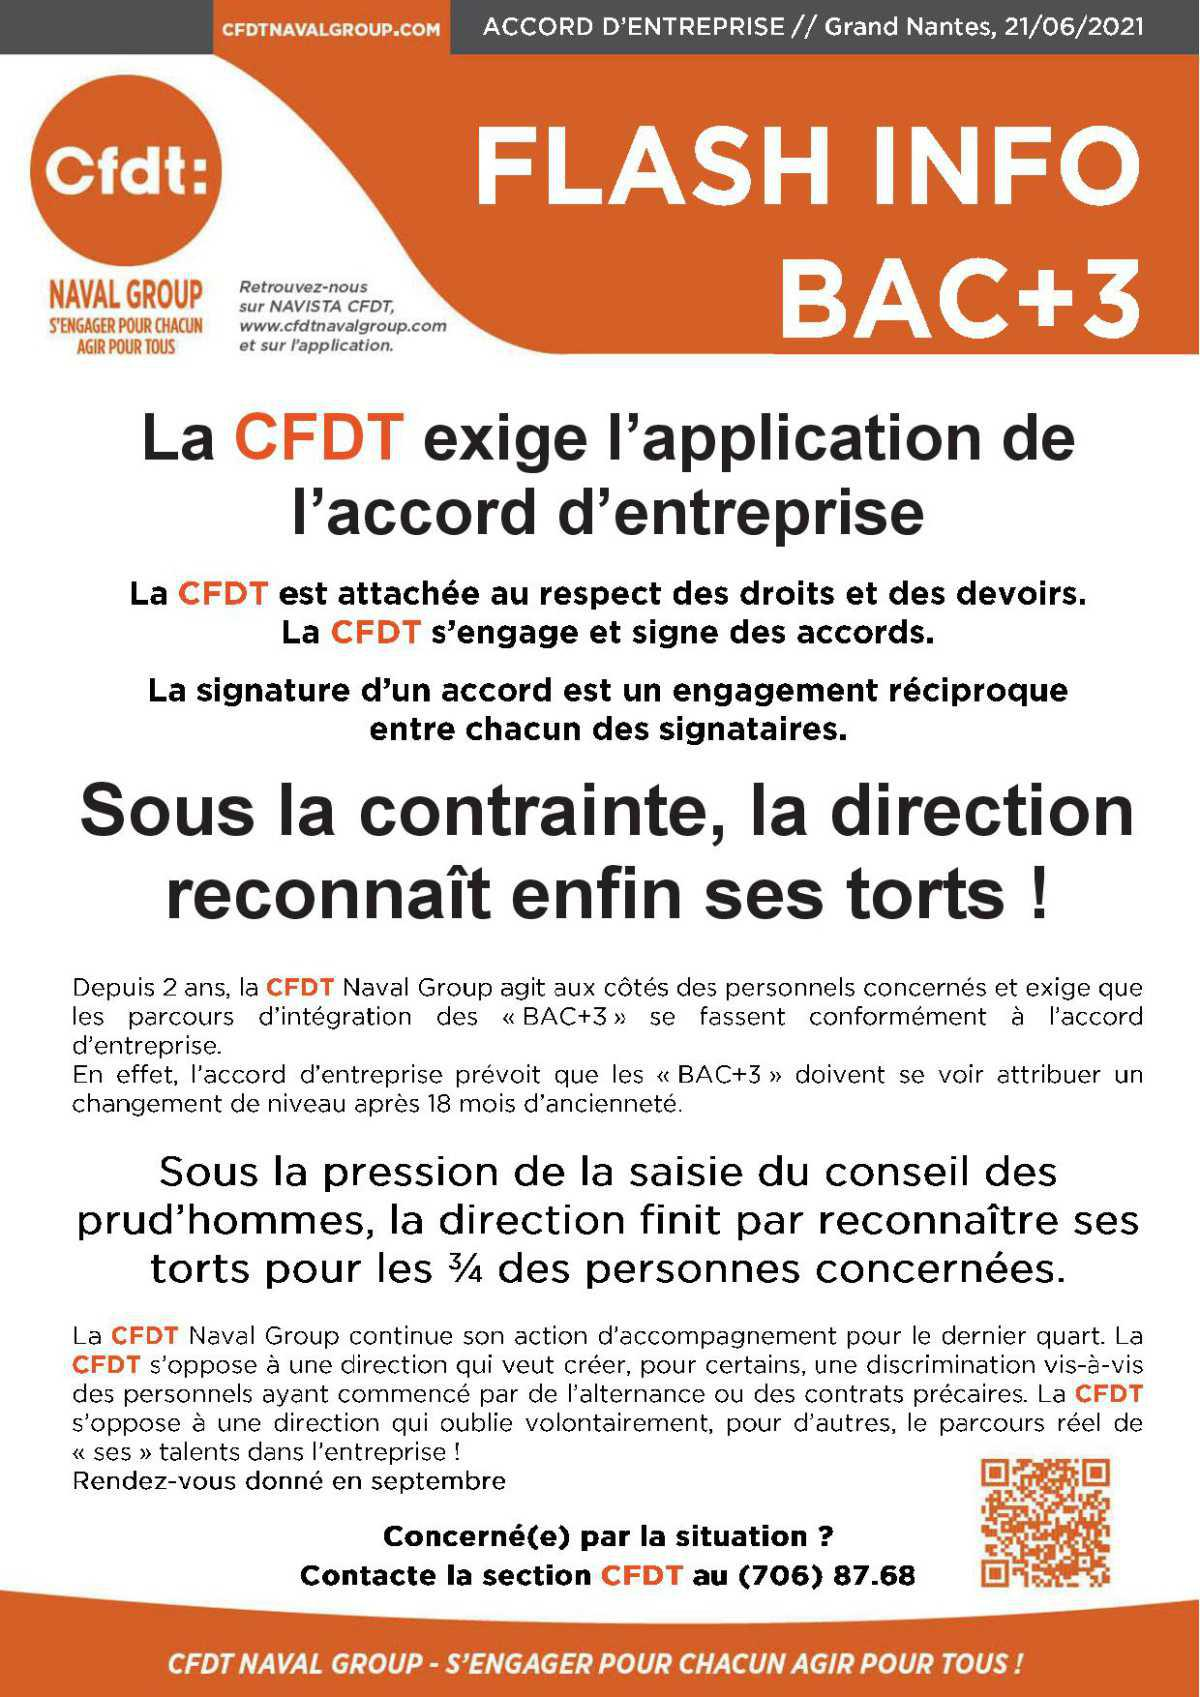 Flash info Bac +3